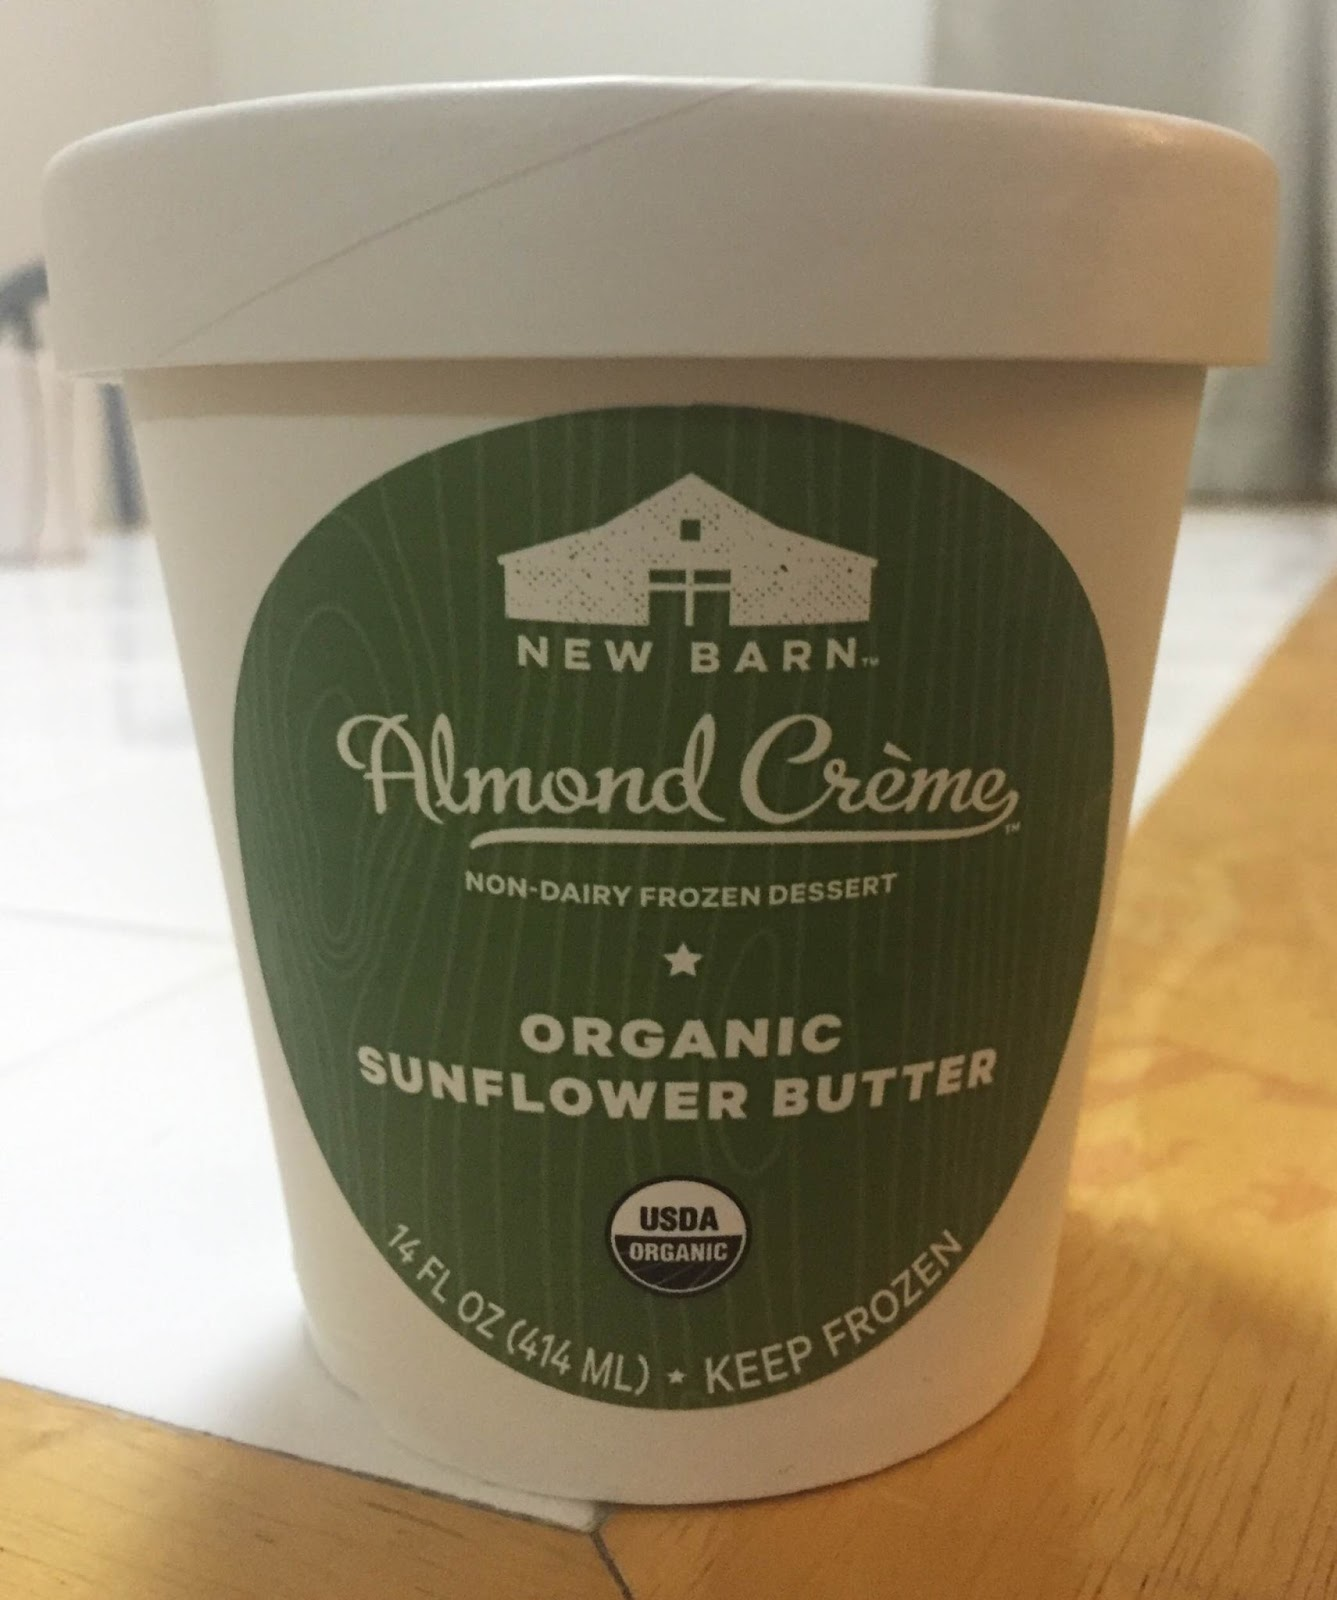 The New Barn Almond Creme Sunflower Butter